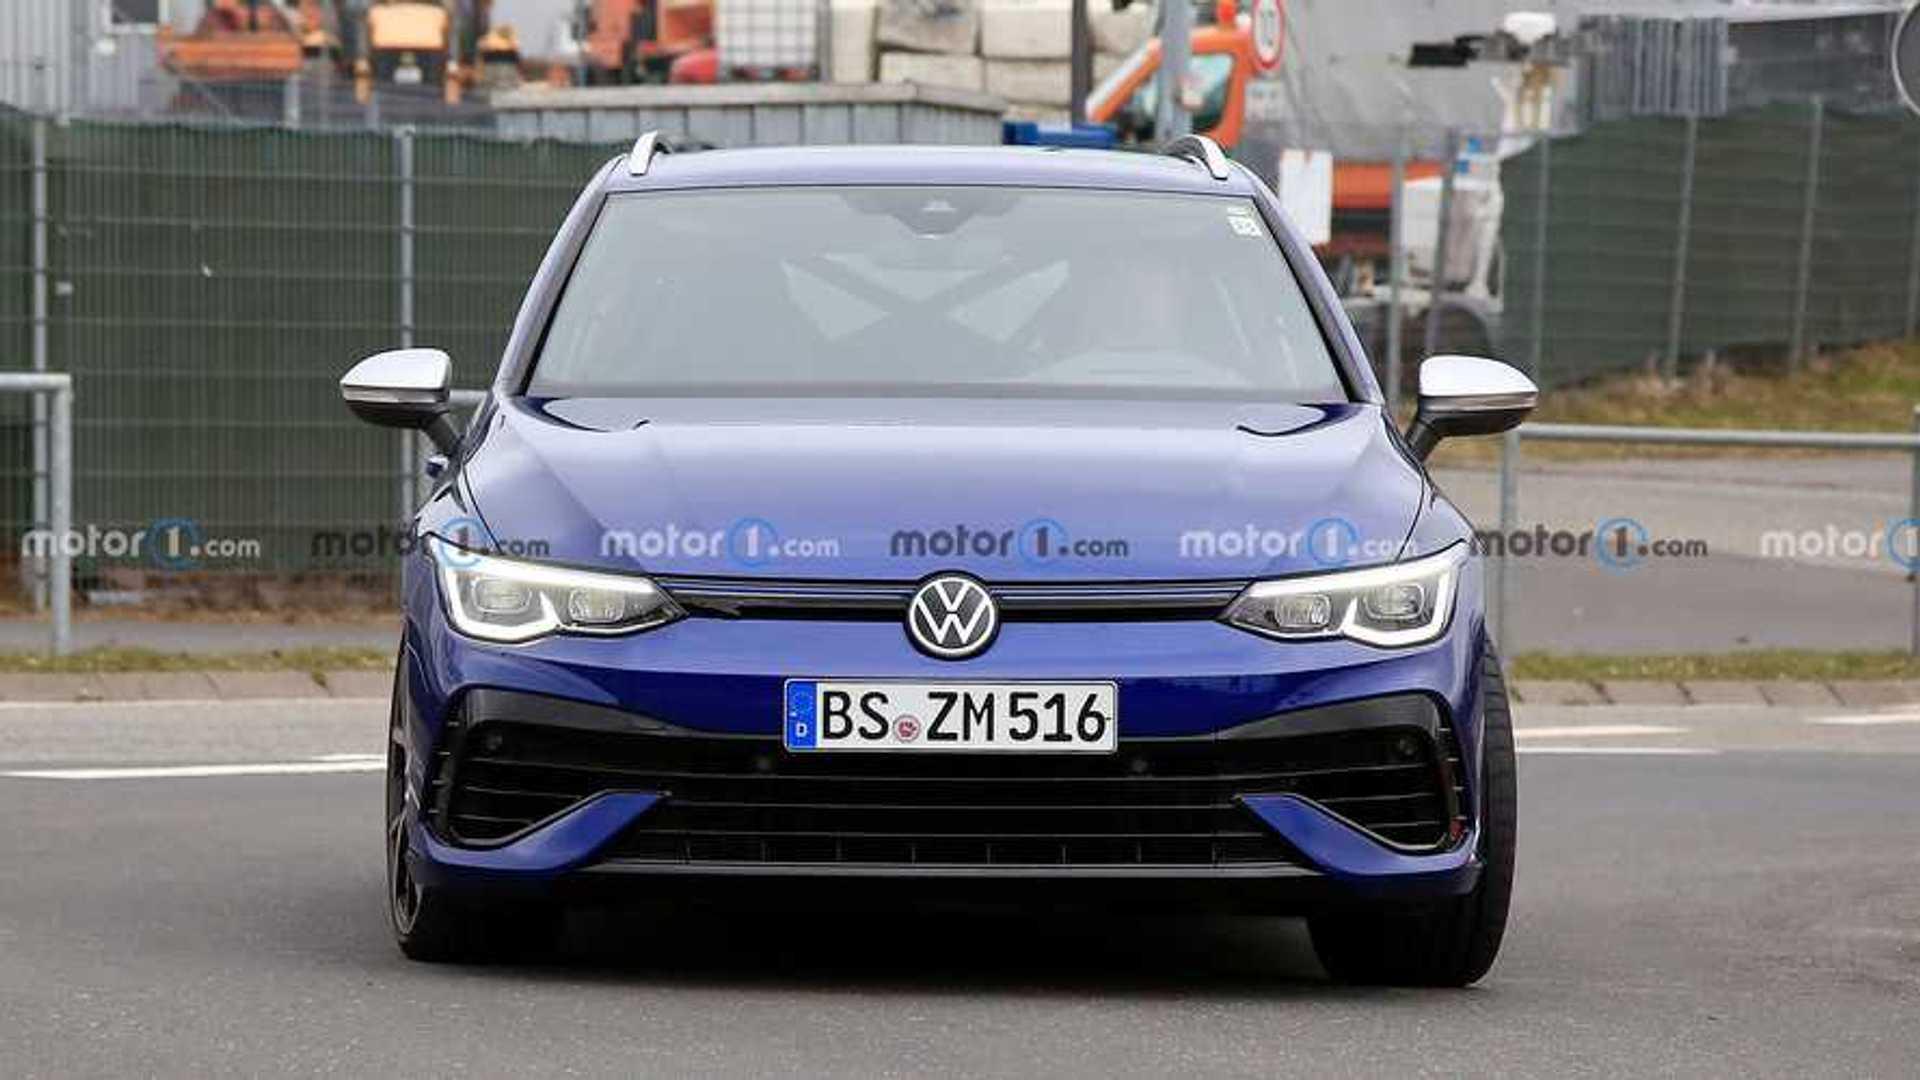 2022 VW Golf R wagon spy photo